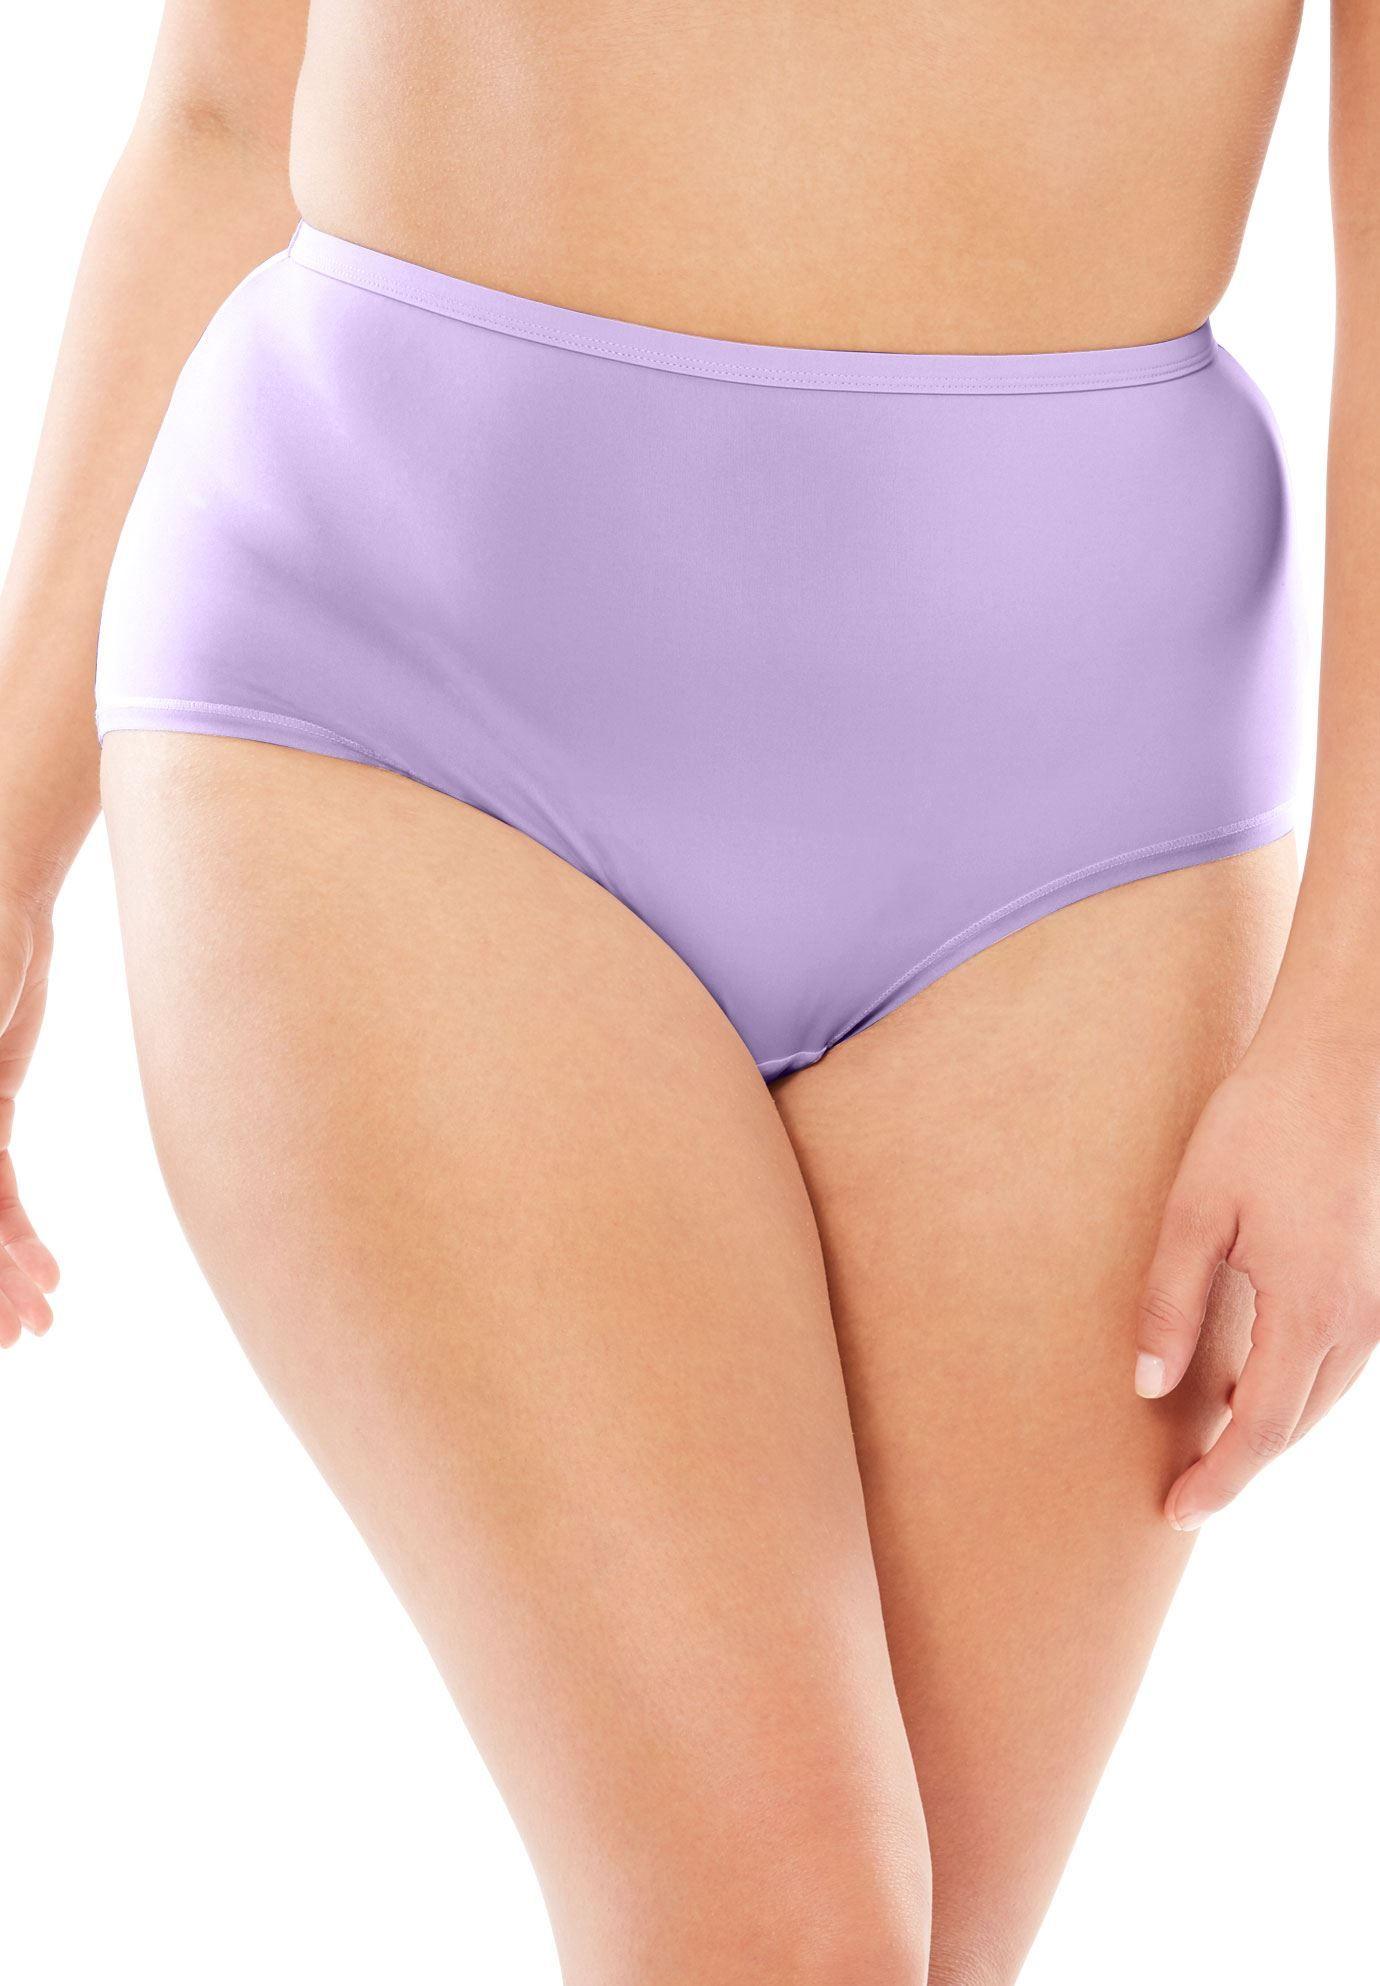 10 PACK Ladies Hi-Leg Briefs Cotton Comfort Knickers Regular Underwear Lingerie